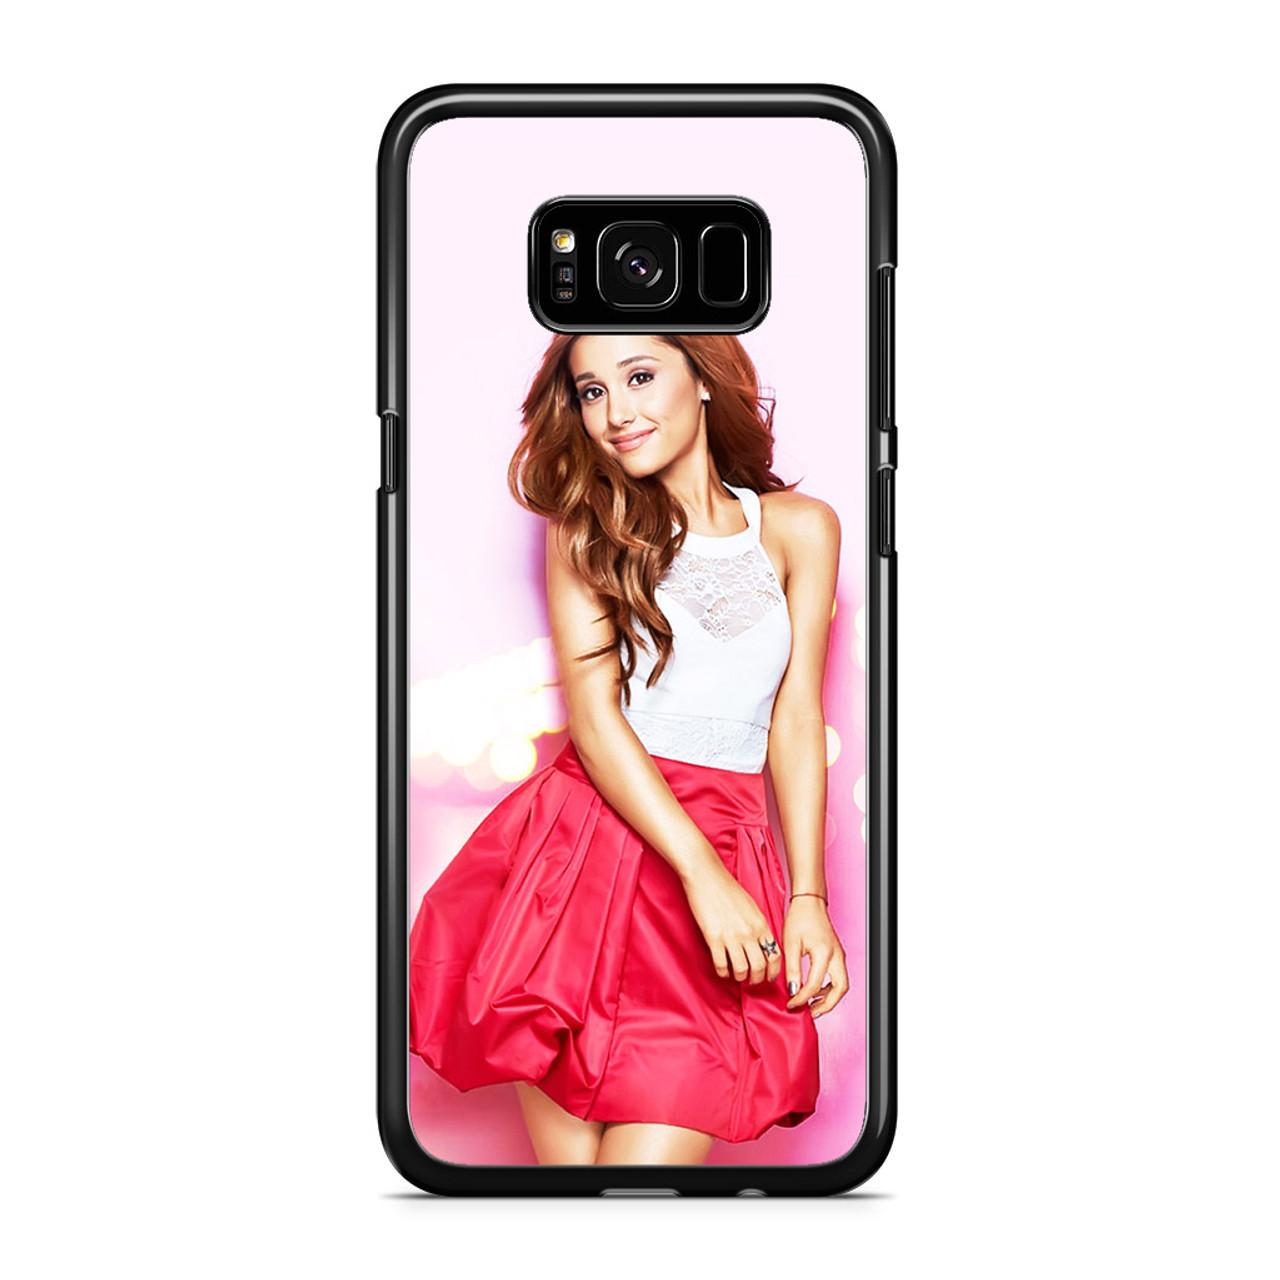 ariana grande phone case samsung s7